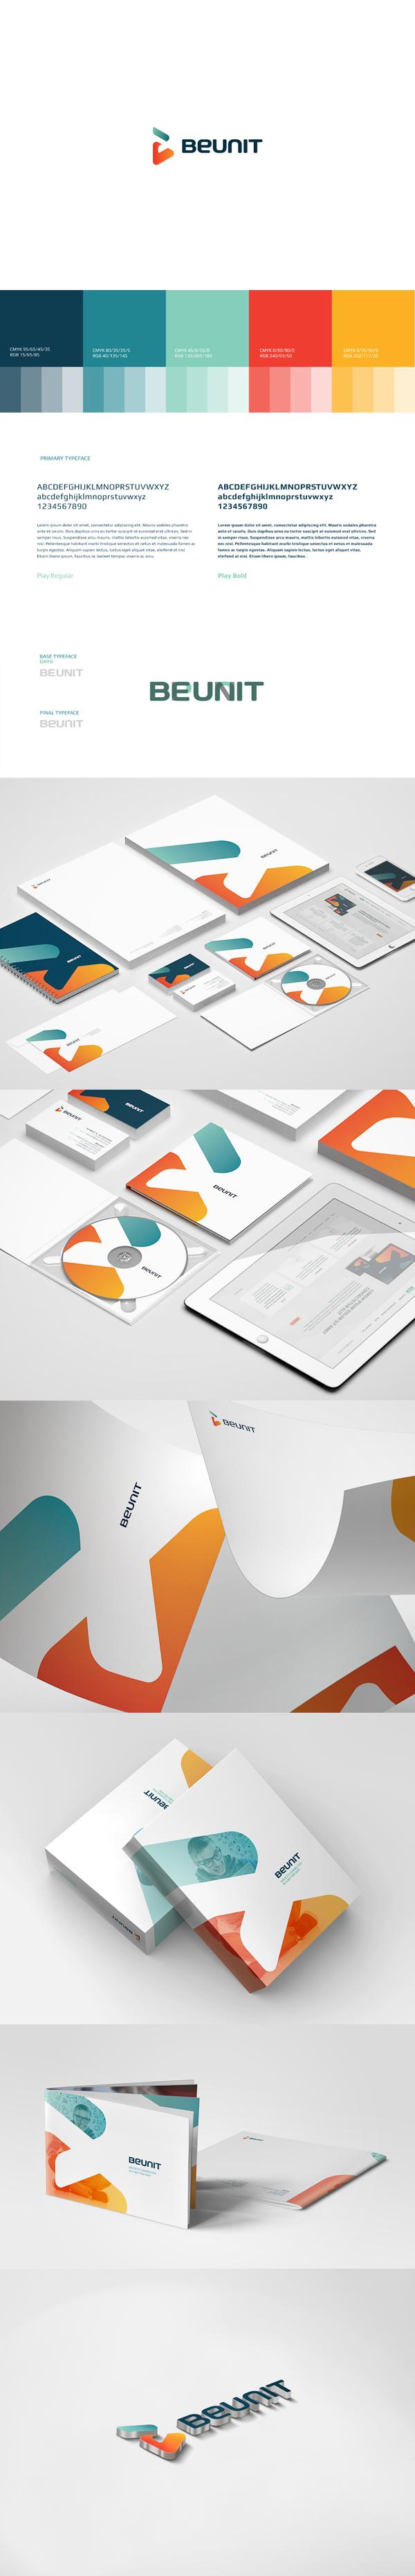 BEUNIT by Ollestudio, via Behance #branding #identity